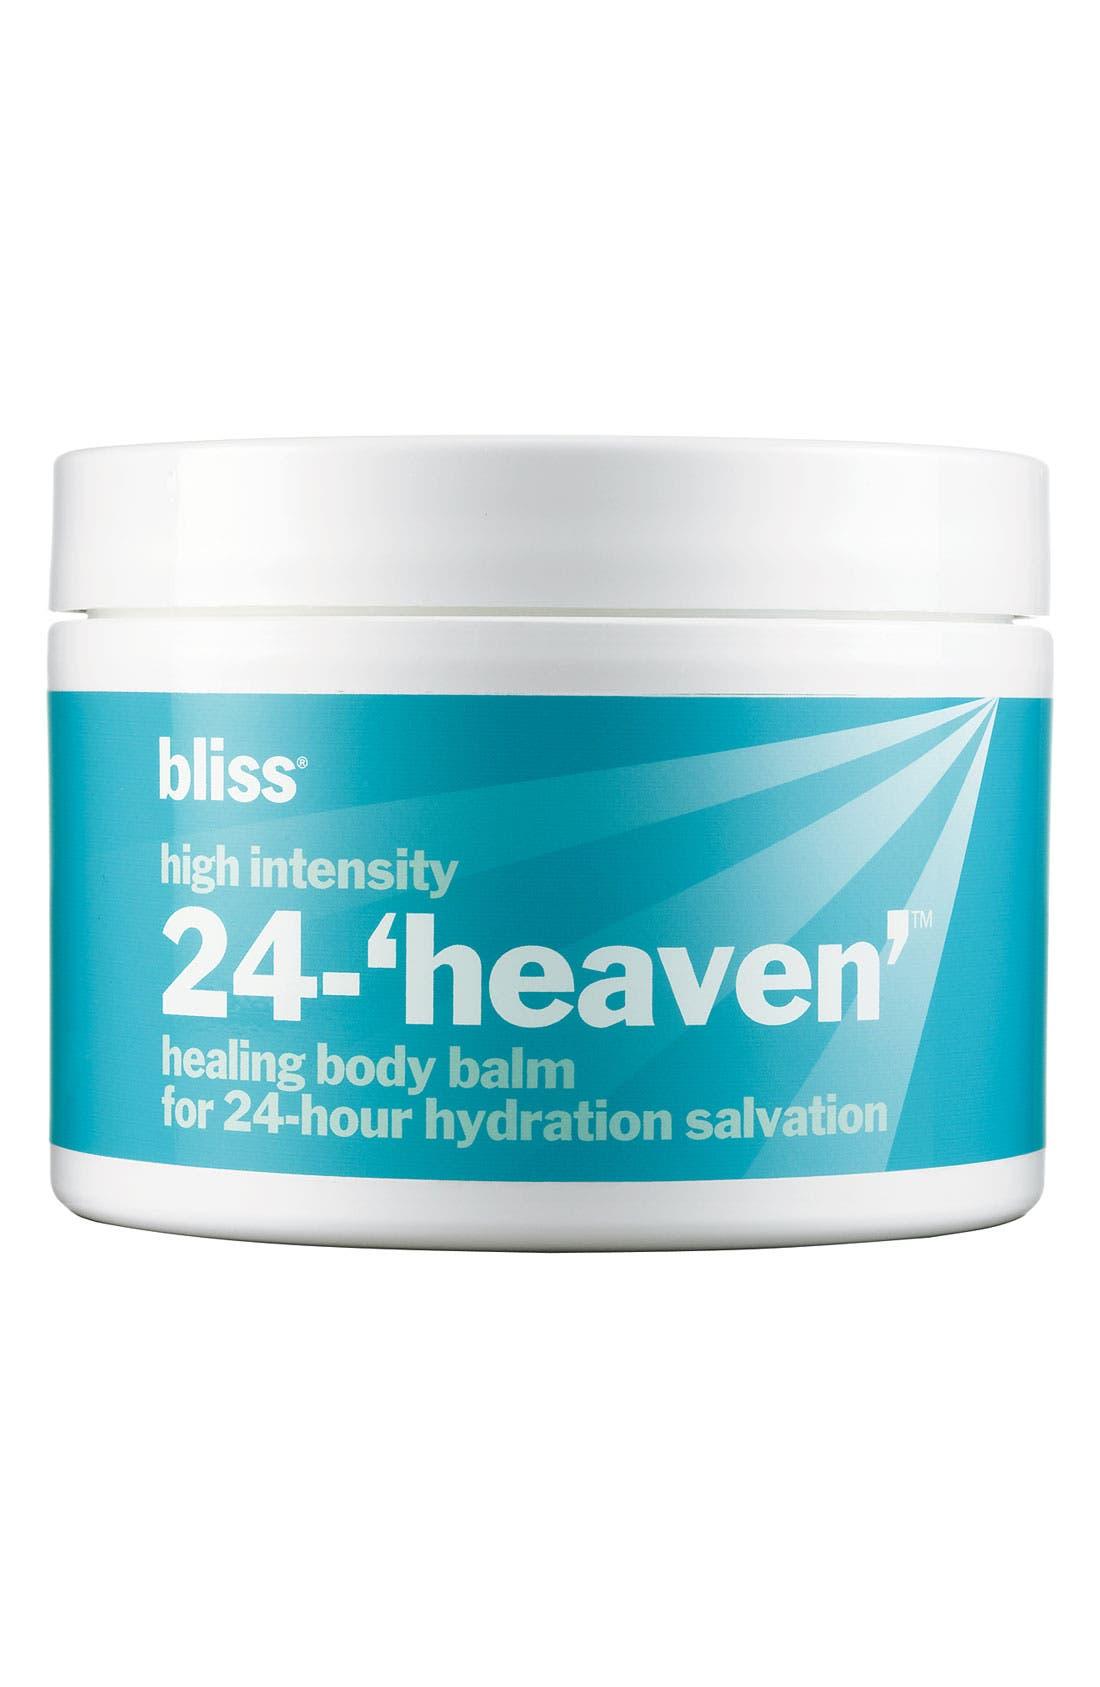 'high intensity 24-heaven' Healing Body Balm,                             Main thumbnail 1, color,                             000